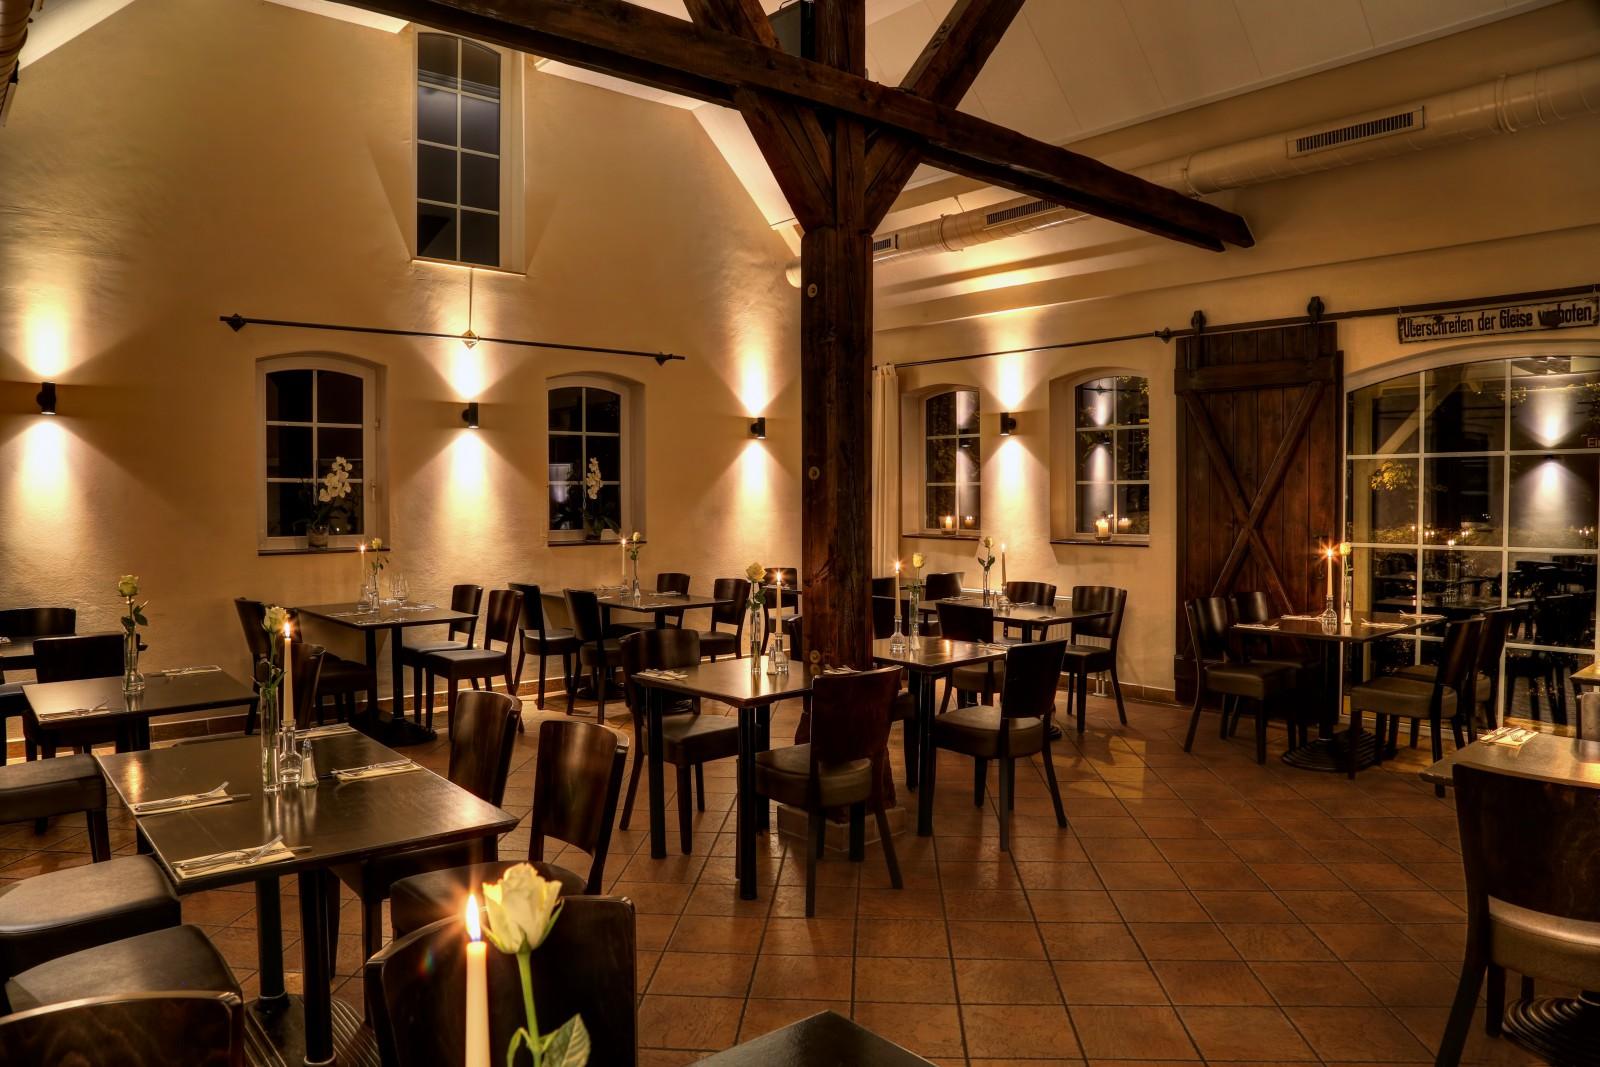 loks restaurant in neum nster. Black Bedroom Furniture Sets. Home Design Ideas